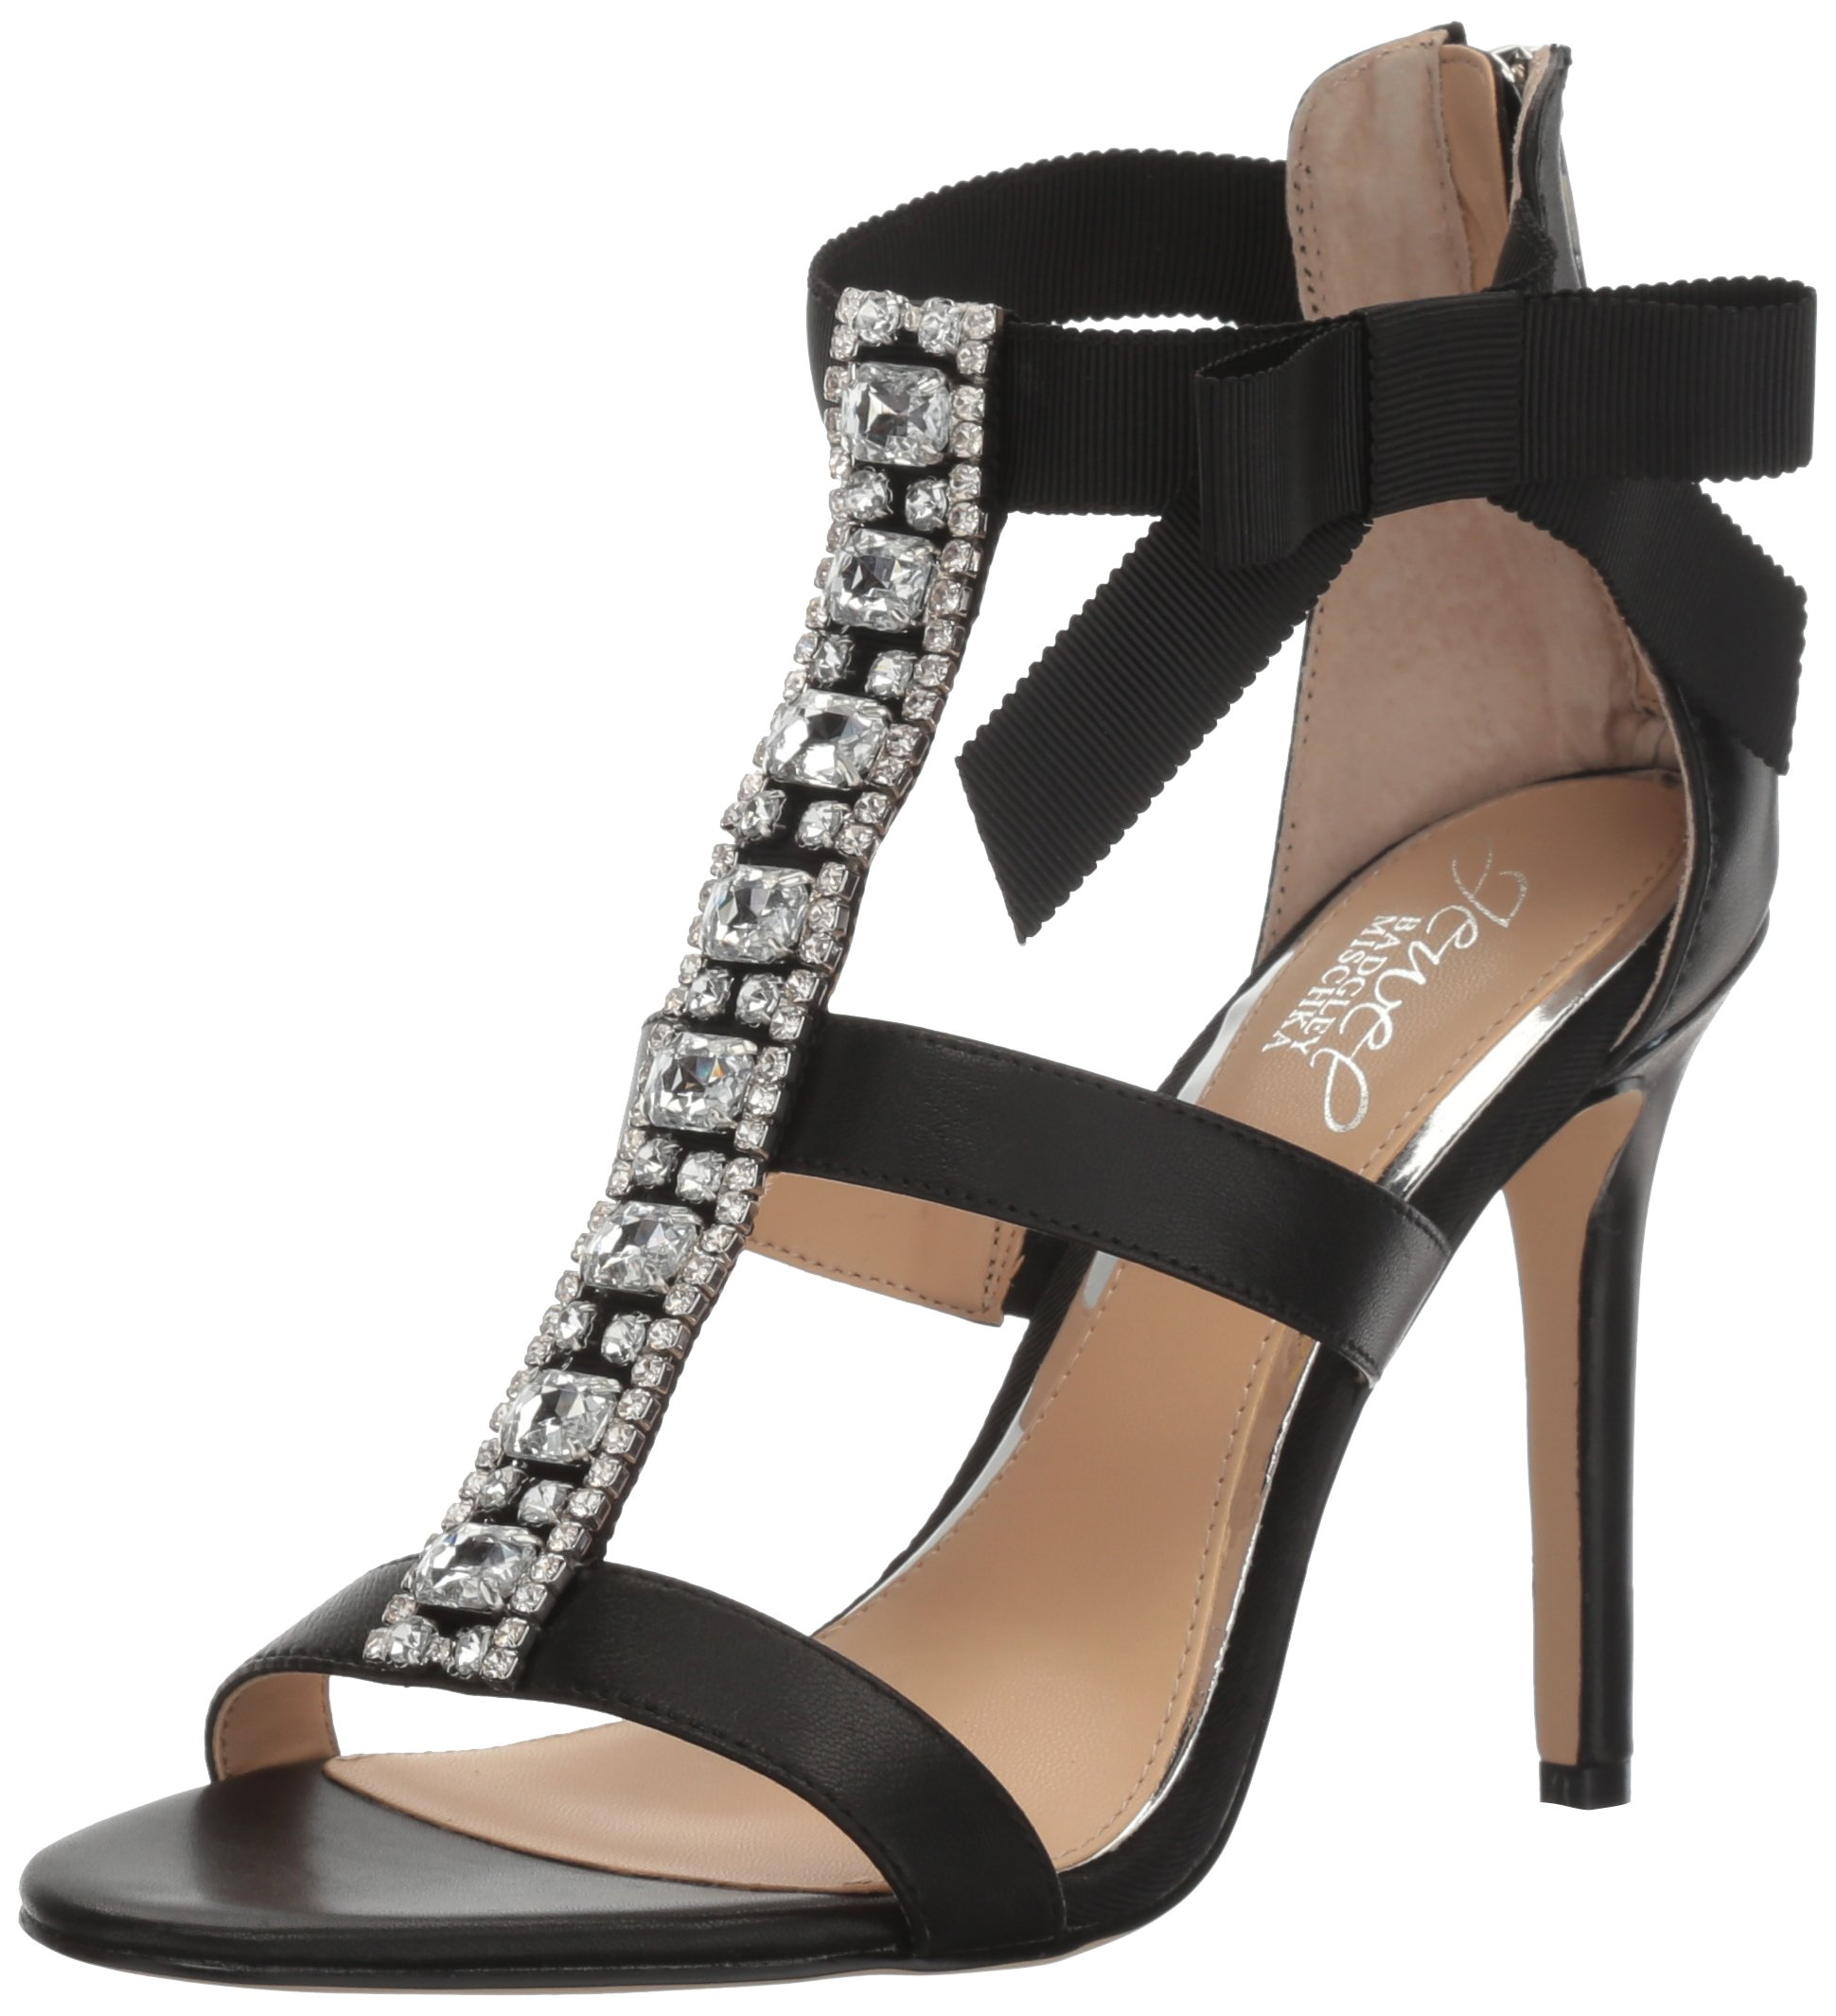 Jewel Badgley Mischka Women's Henderson Dress Sandal, Black, 10 M US